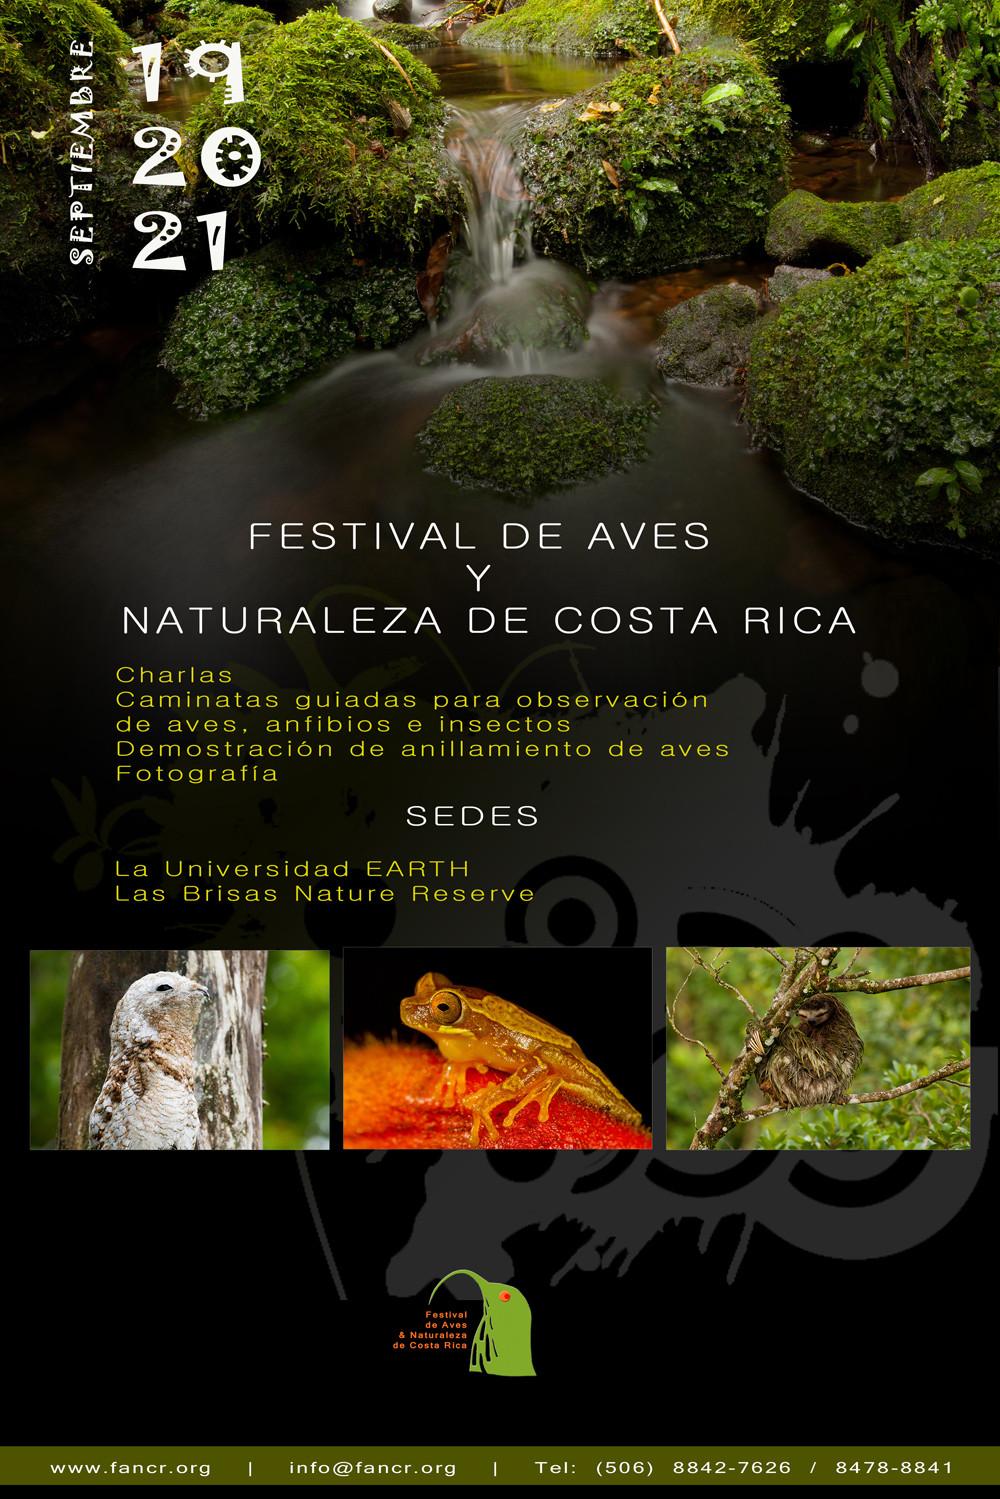 Las Brisas Nature Reserve | Costa Rica | Festival de Aves y Naturaleza